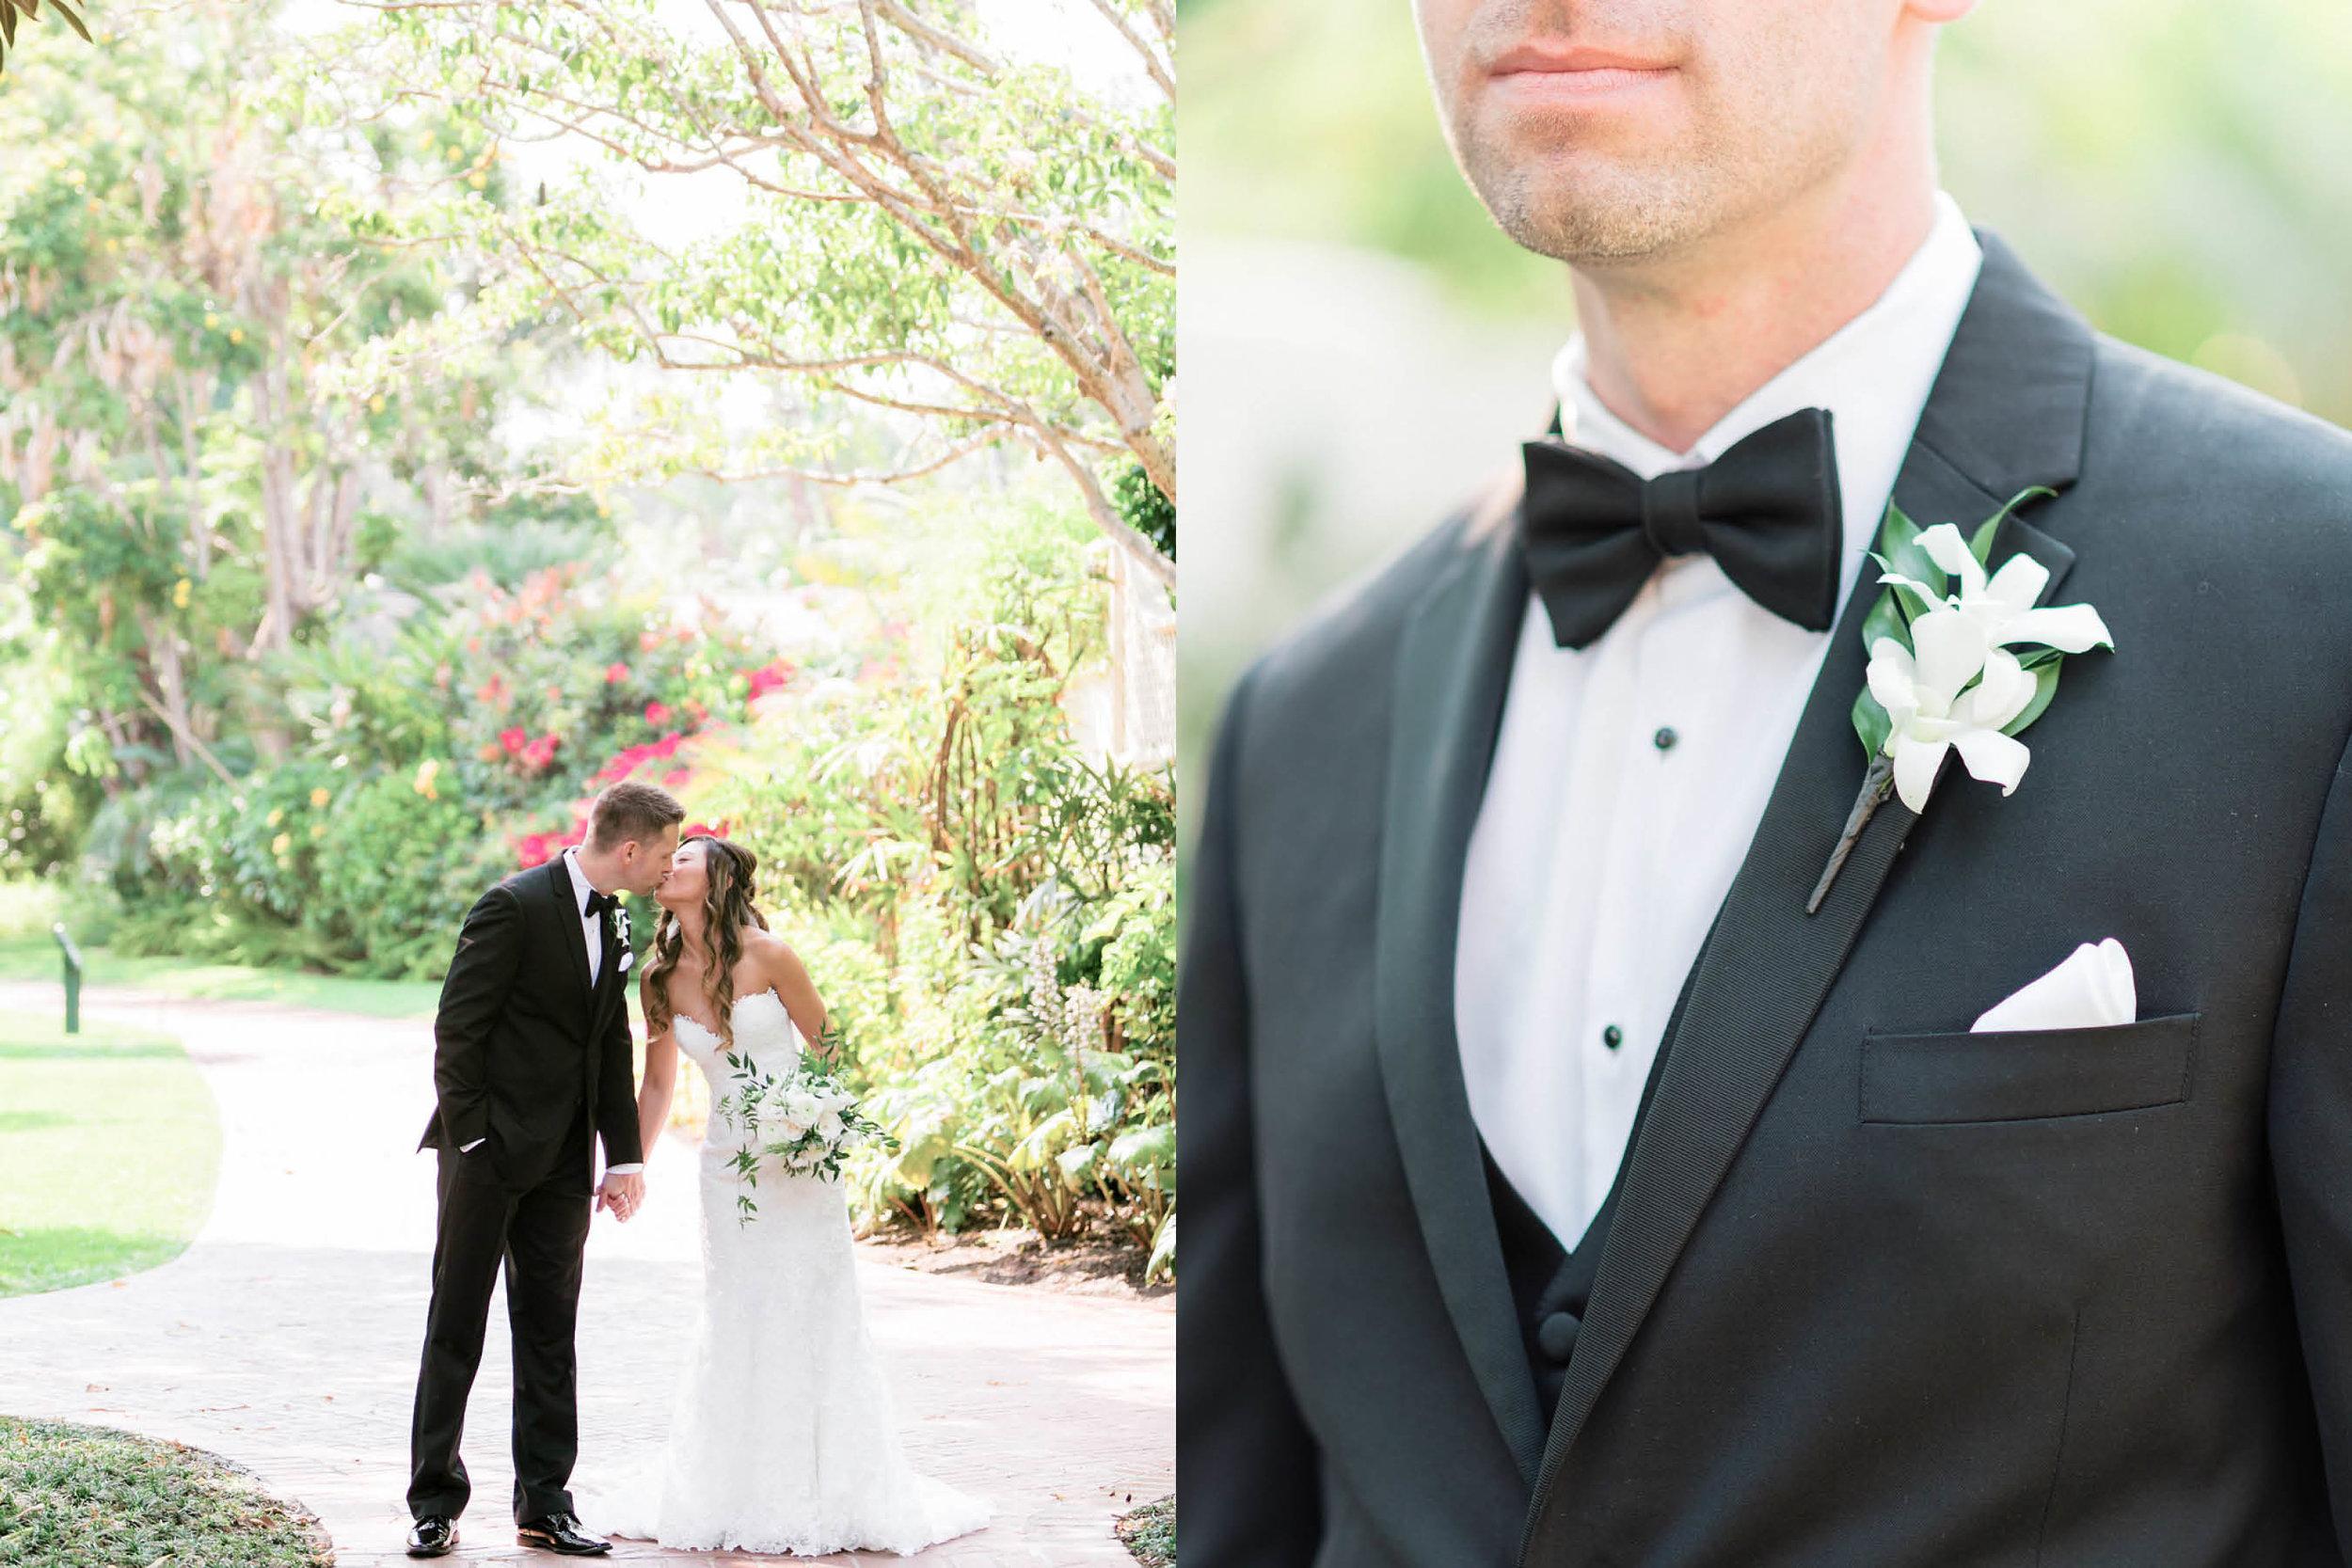 santa-barbara-elopement-elope-wedding-planner-coordinator-day-of-four-seasons-biltmore-ocean-front-view-garden-pink-white-green-montecito-black-tie (8).jpg